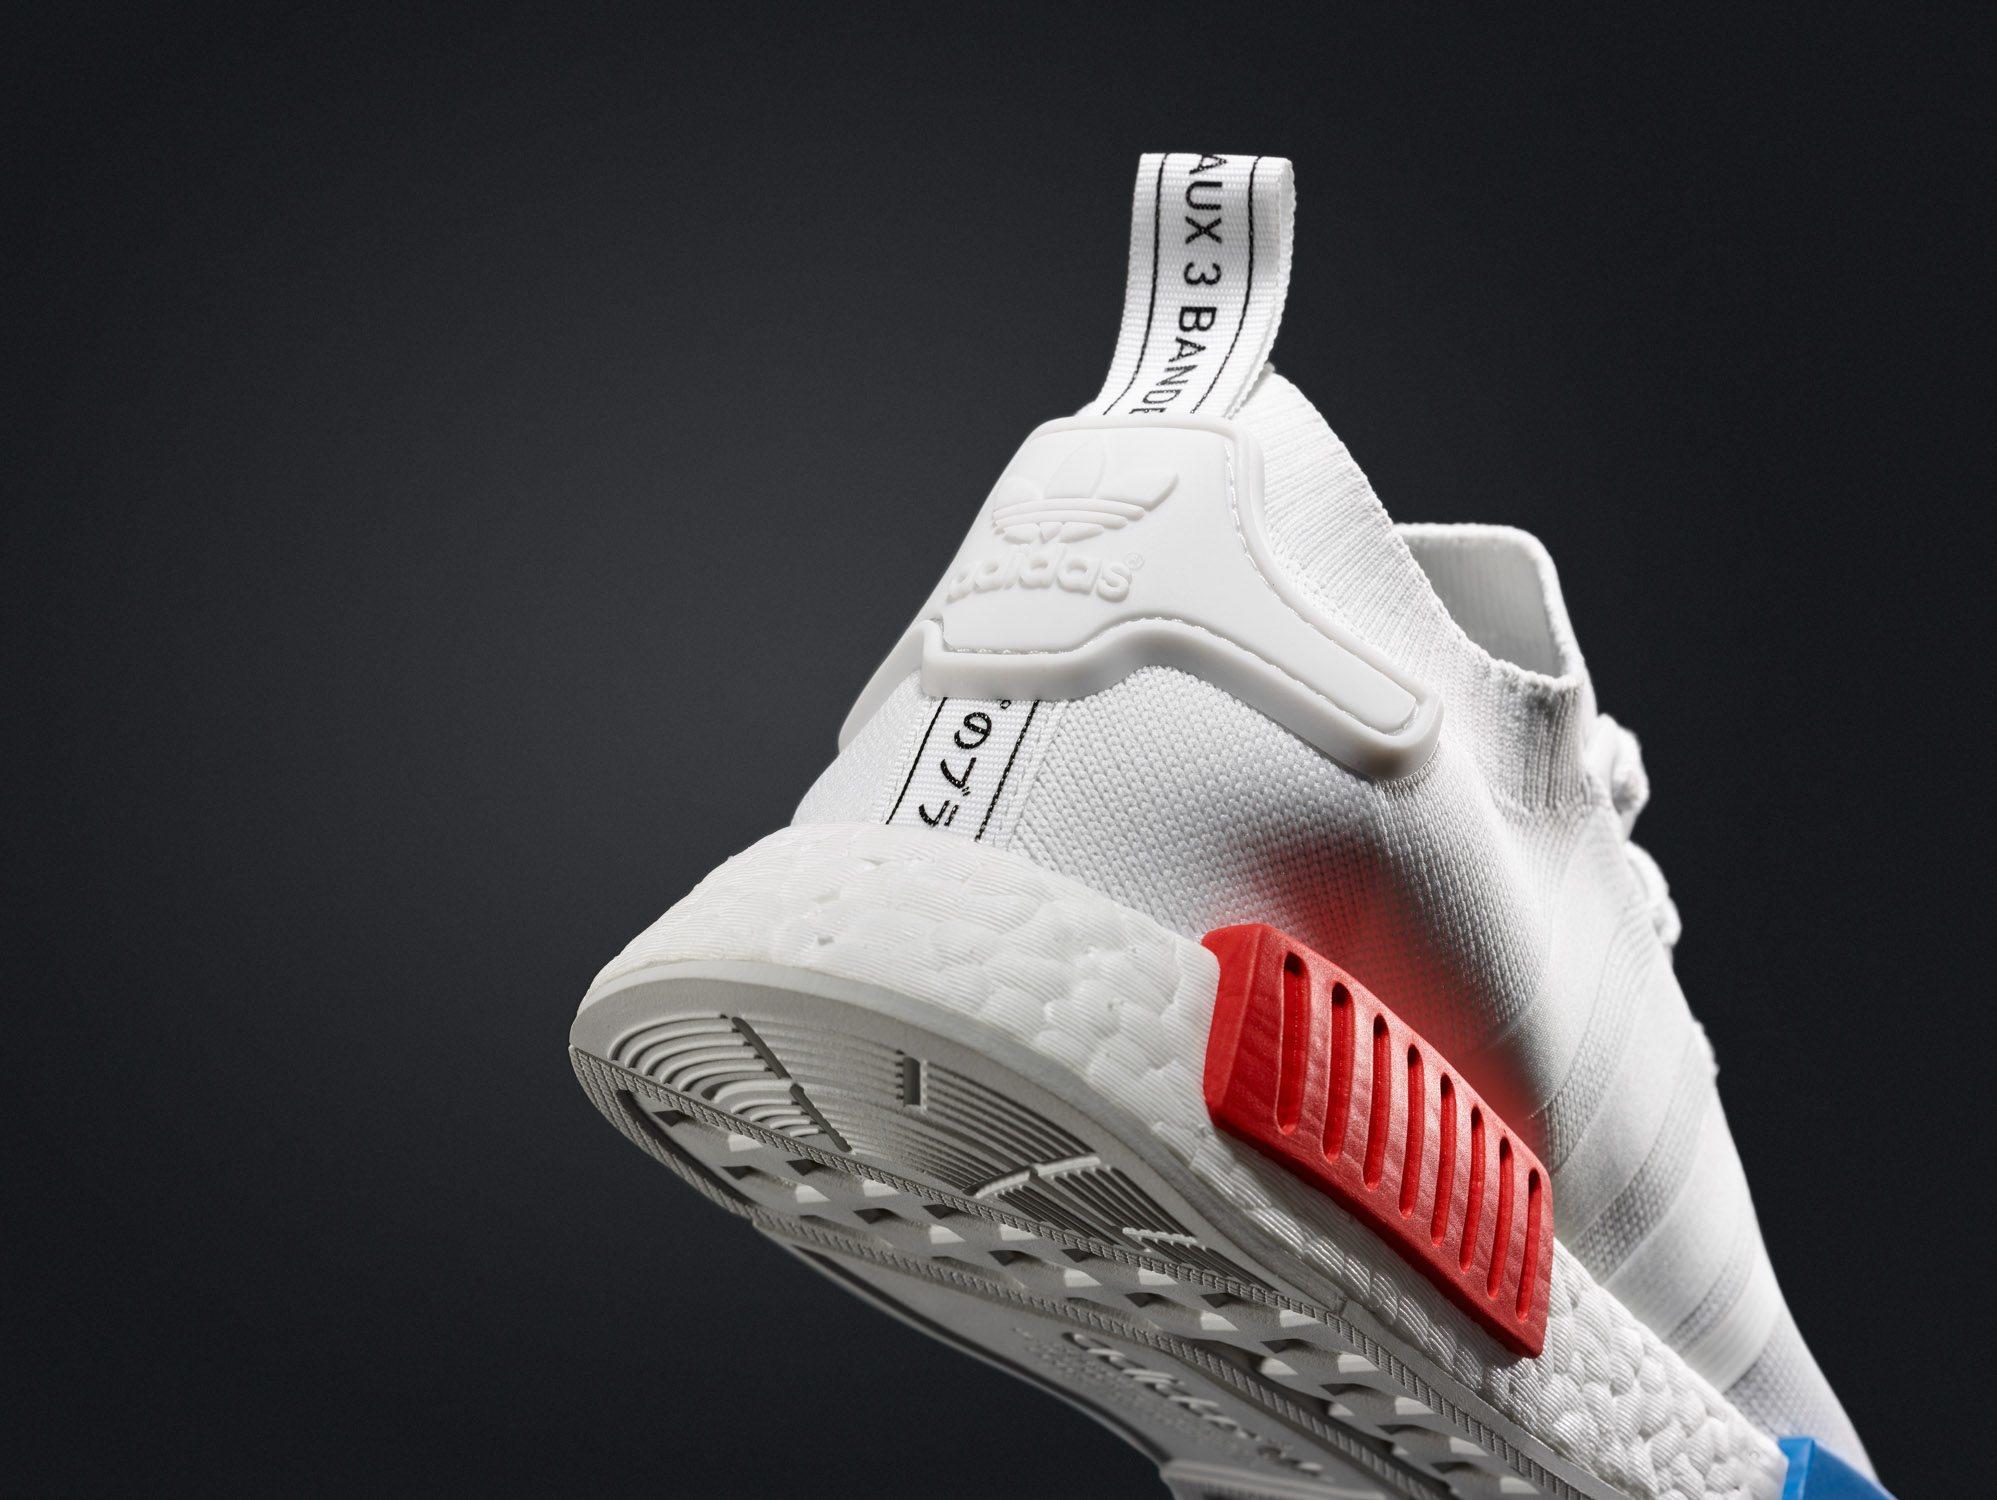 adidas NMD Primeknit White OG 5